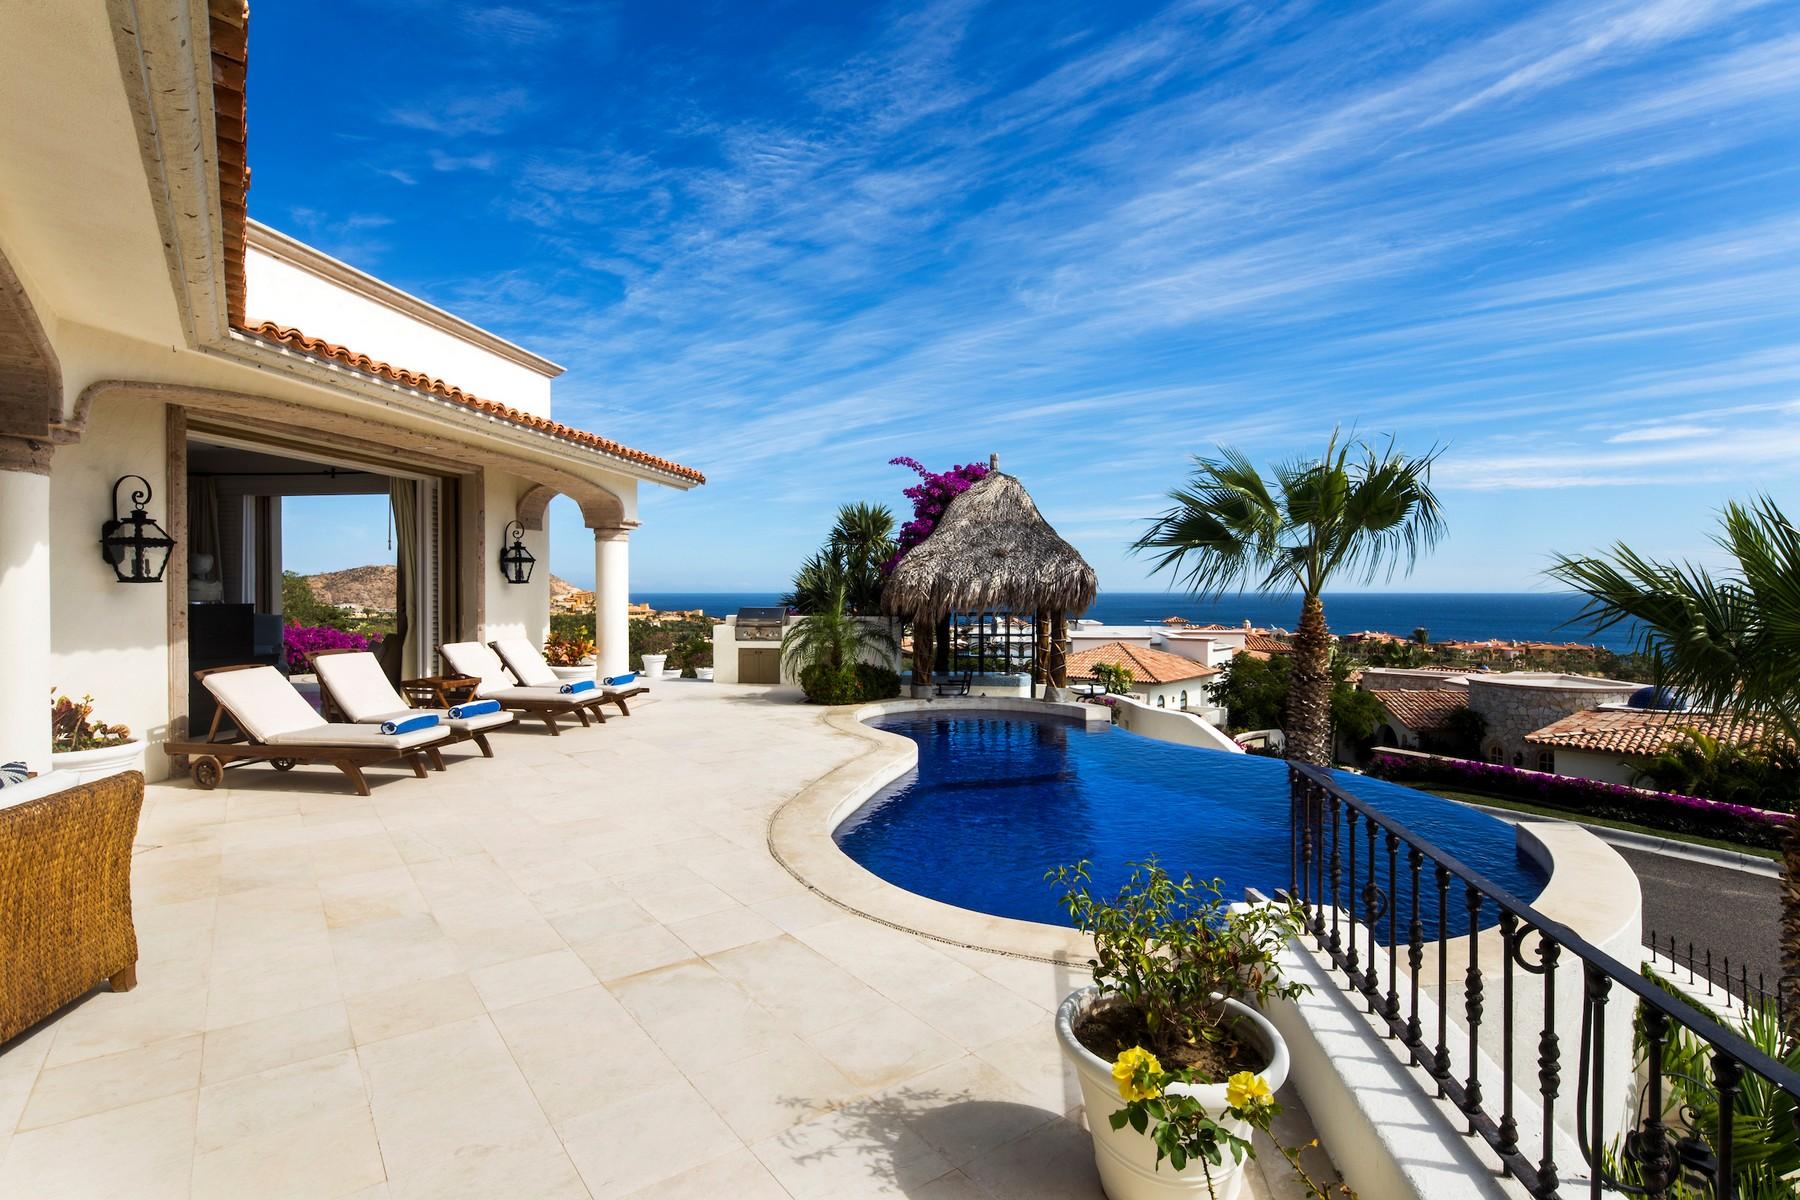 Additional photo for property listing at Casa Buena Vida Las Colinas Lote 34 Casa Buena Vida Cabo San Lucas, Baja California Sur 23455 México